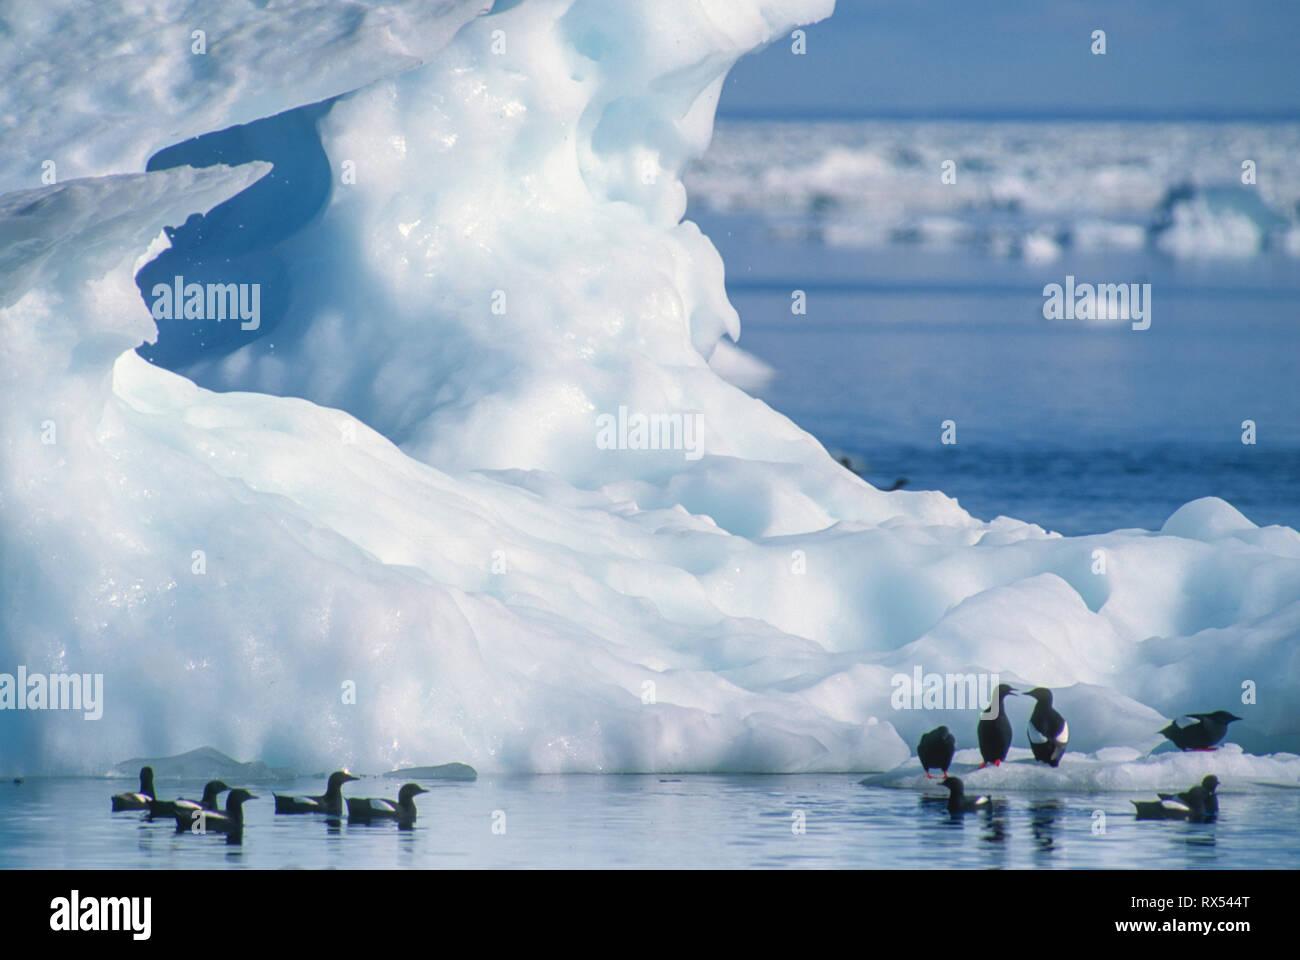 Black guillemots, Cephus grylle, on floe ice, July 23, 2001, Wager Bay, Nunavut, Canada - Stock Image